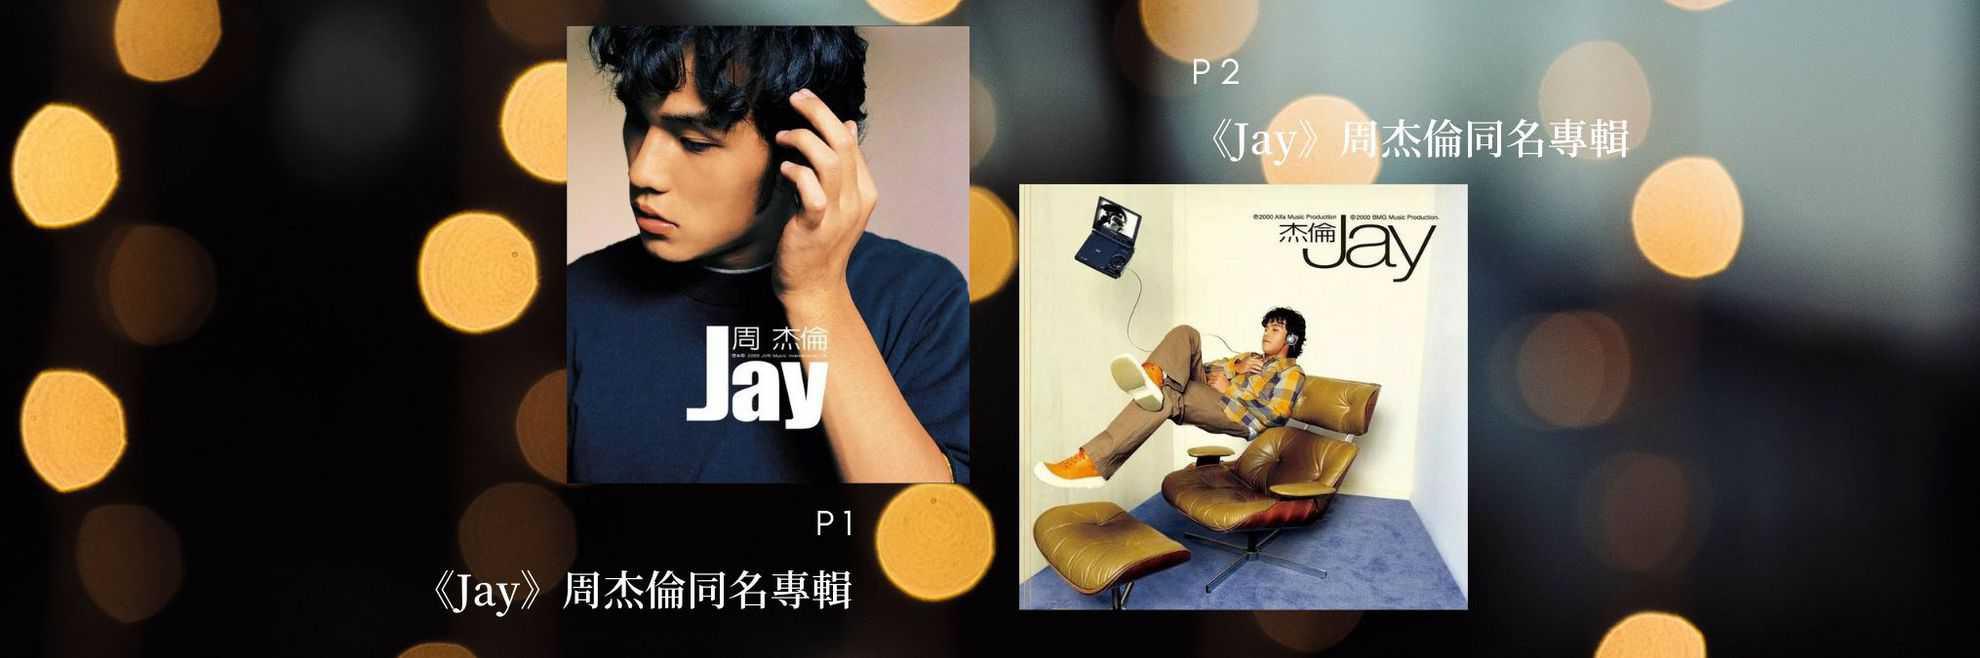 Jay,周杰倫首張專輯 (同名專輯) P1 and P2 - 2000 年